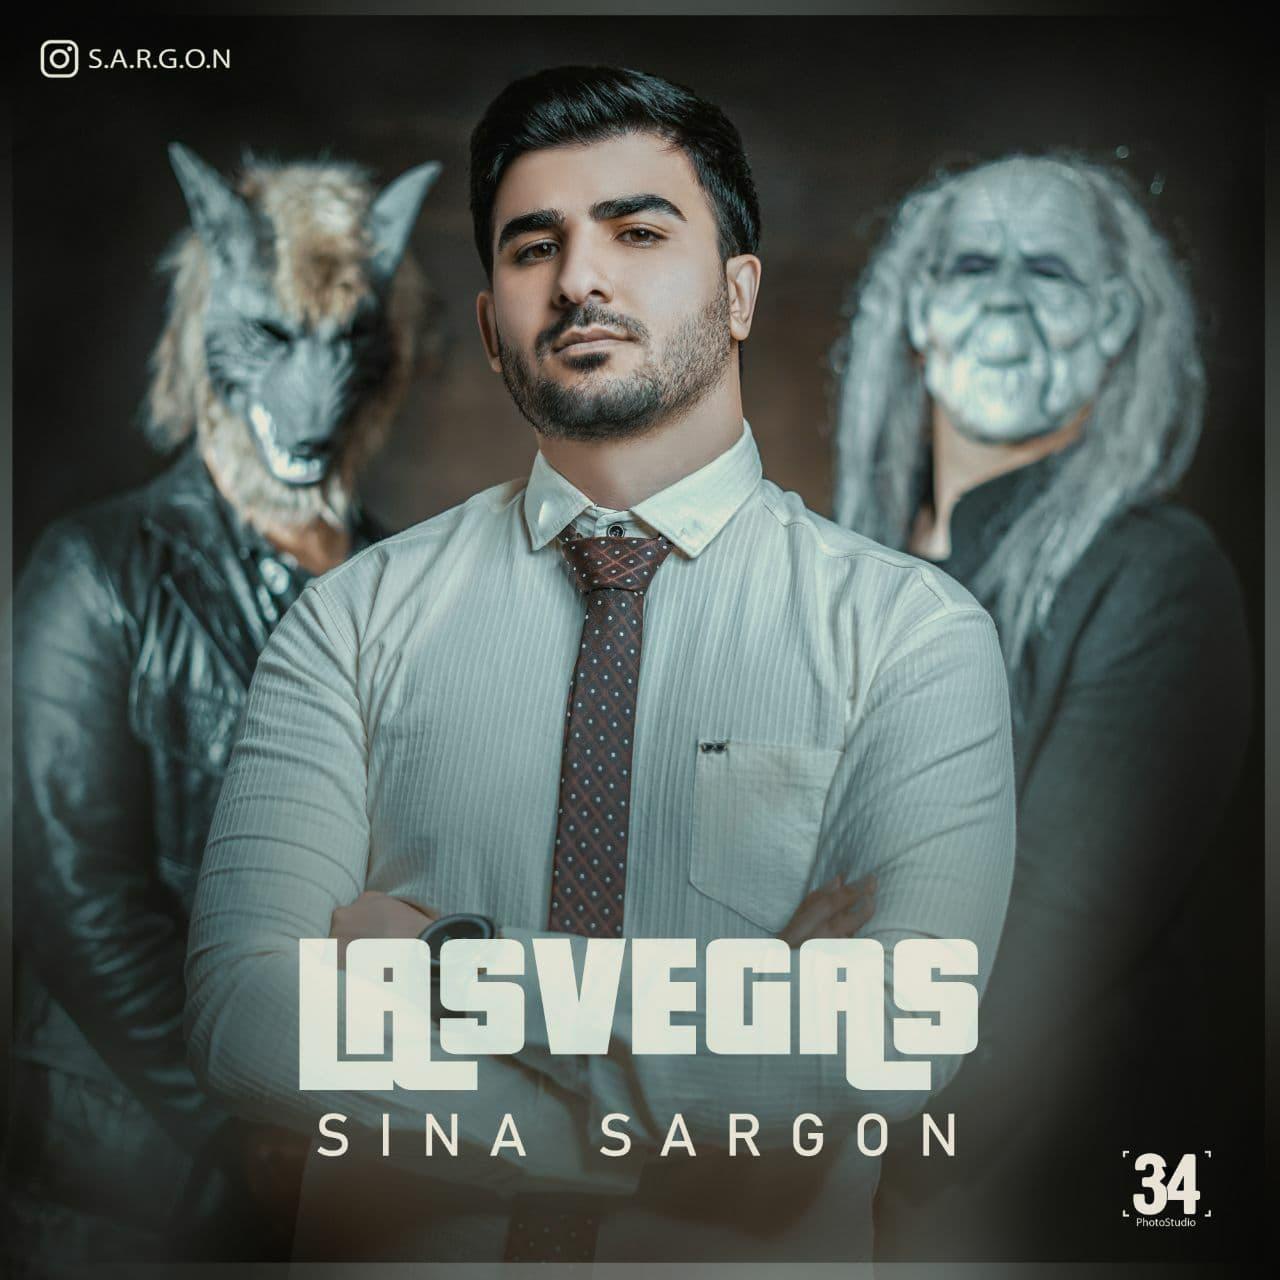 Sina Sargon – Lasvegas